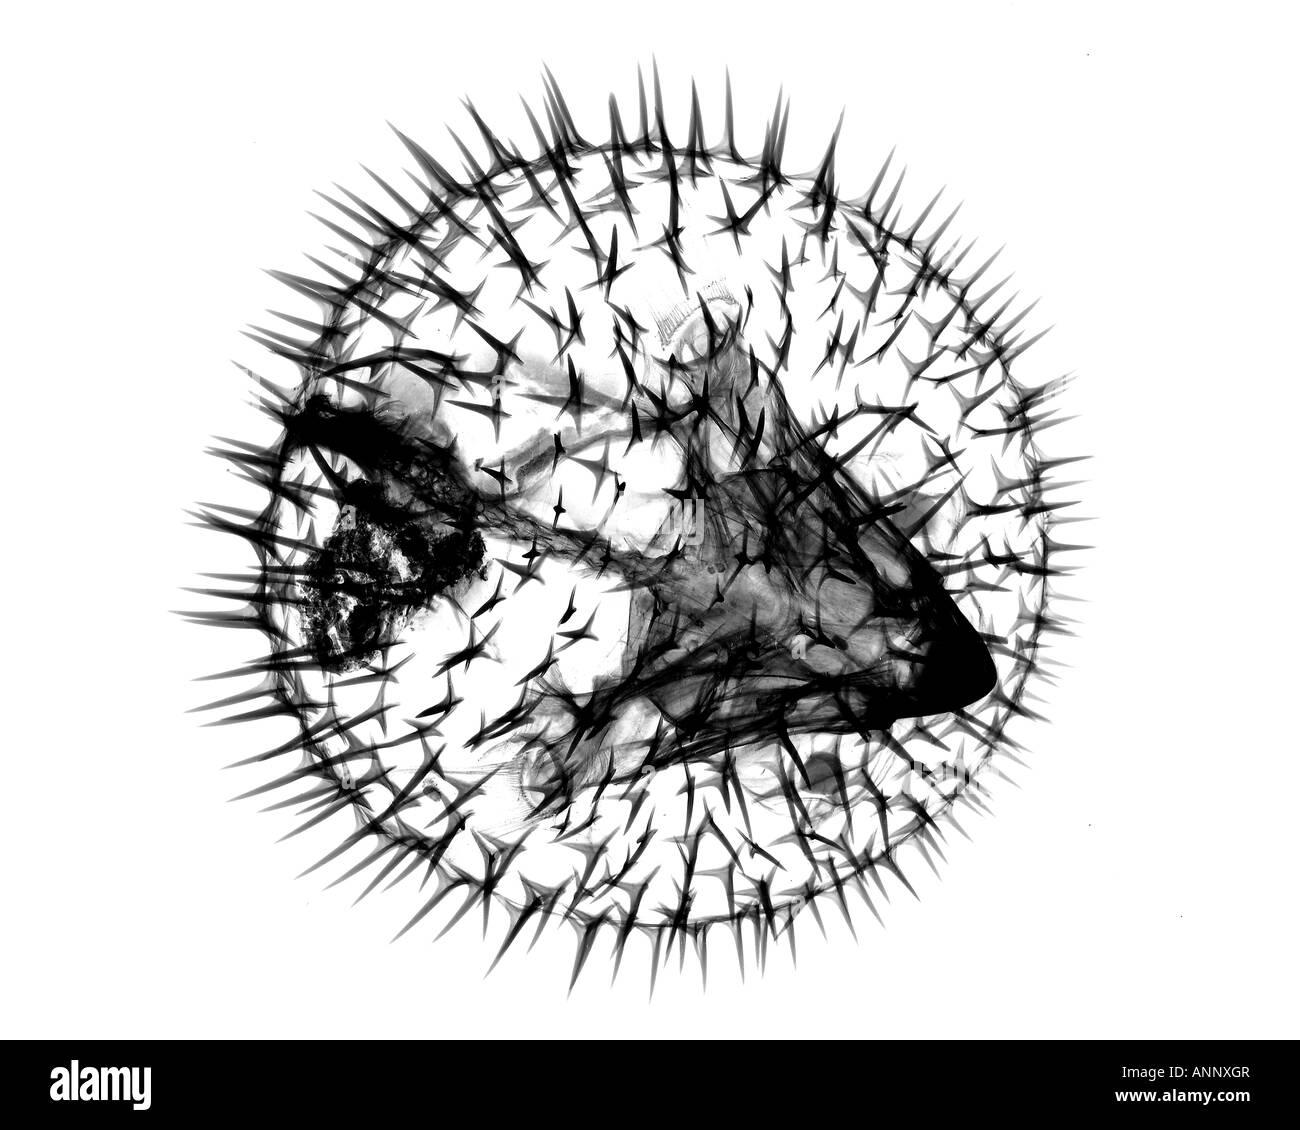 Porcupine puffer fish - Stock Image